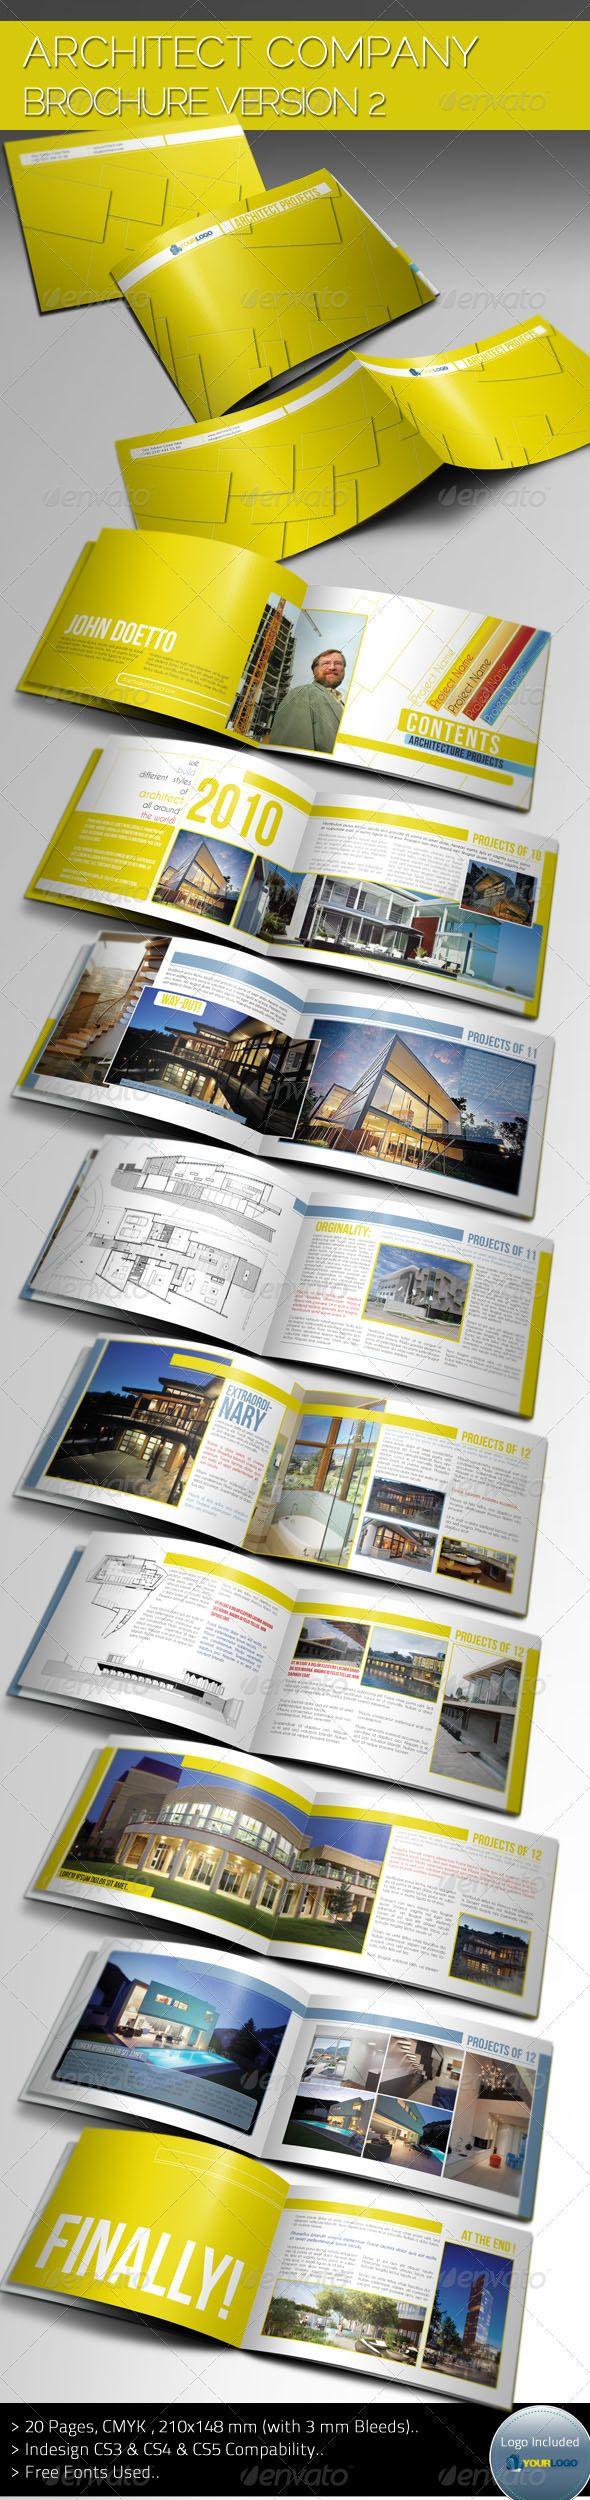 pdf portfolio layouts downloads